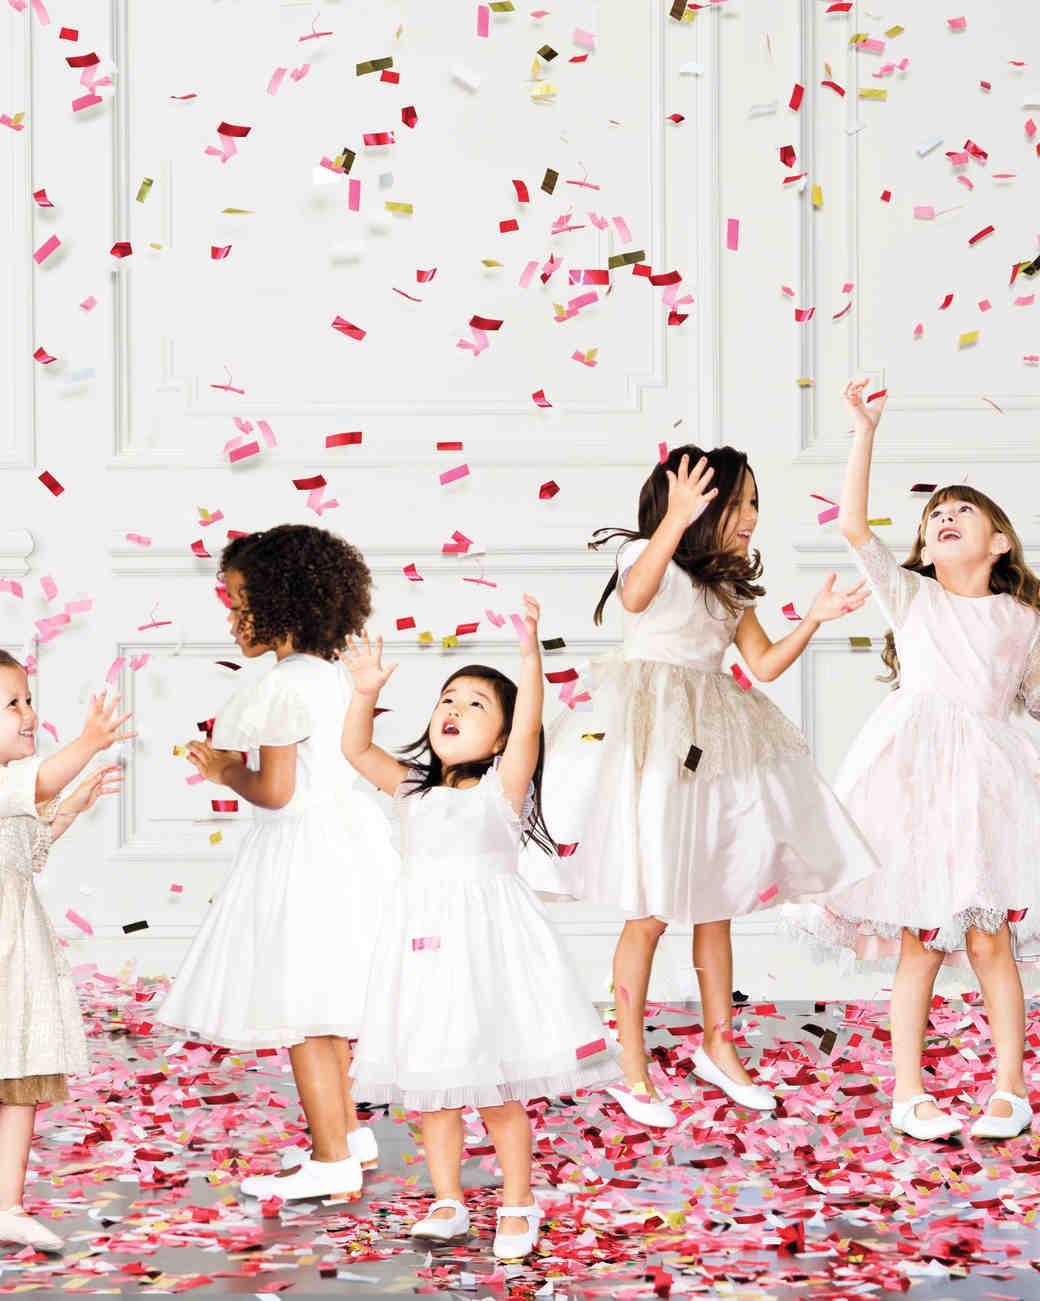 confetti-girls-d111518.jpg